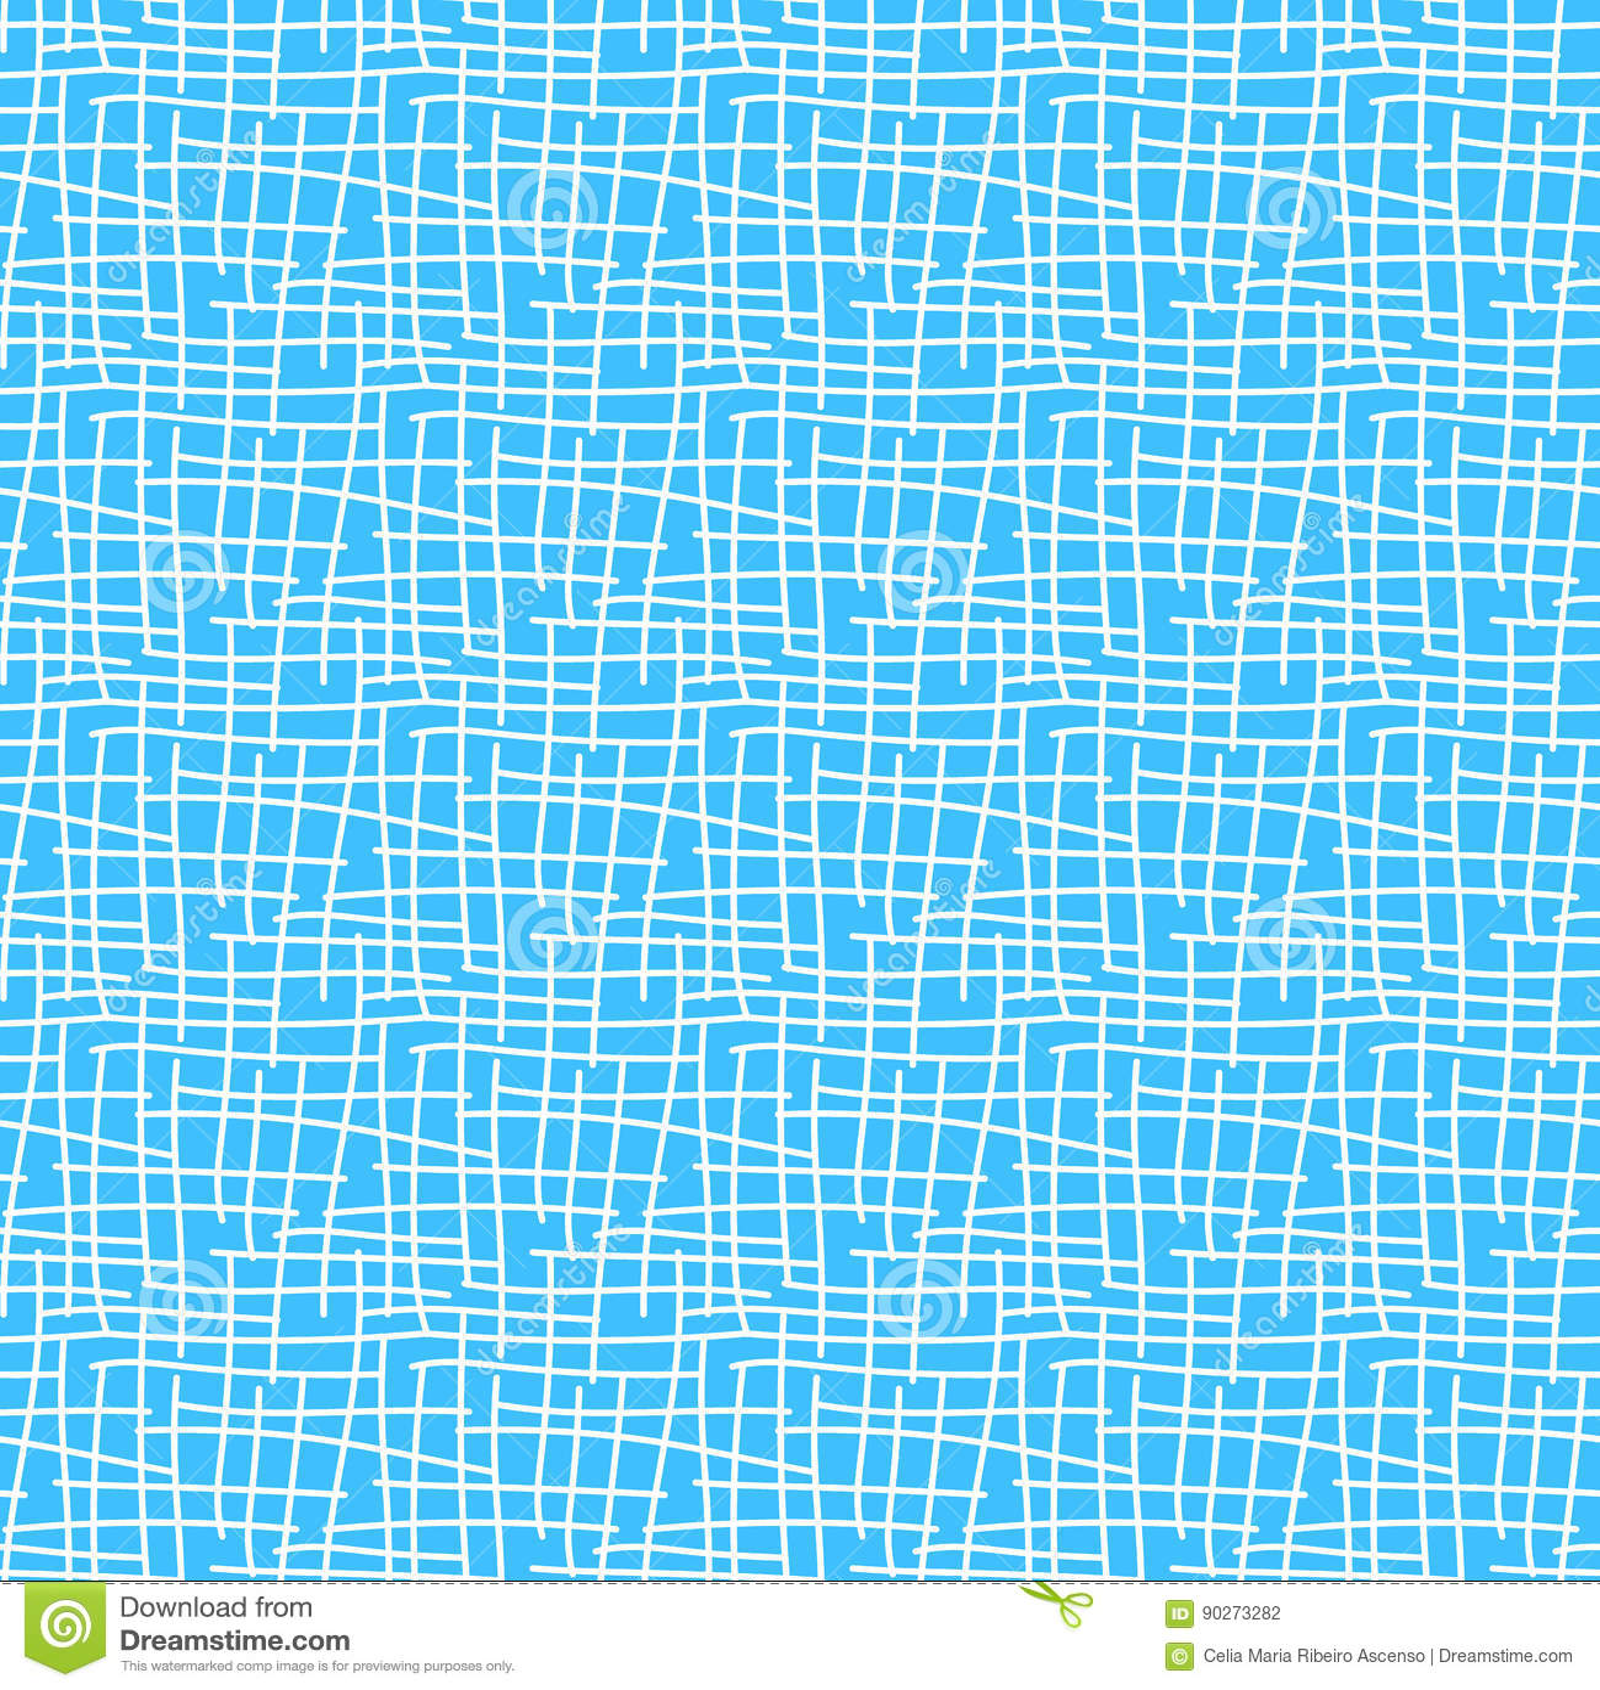 Crossed lines pool seamless background